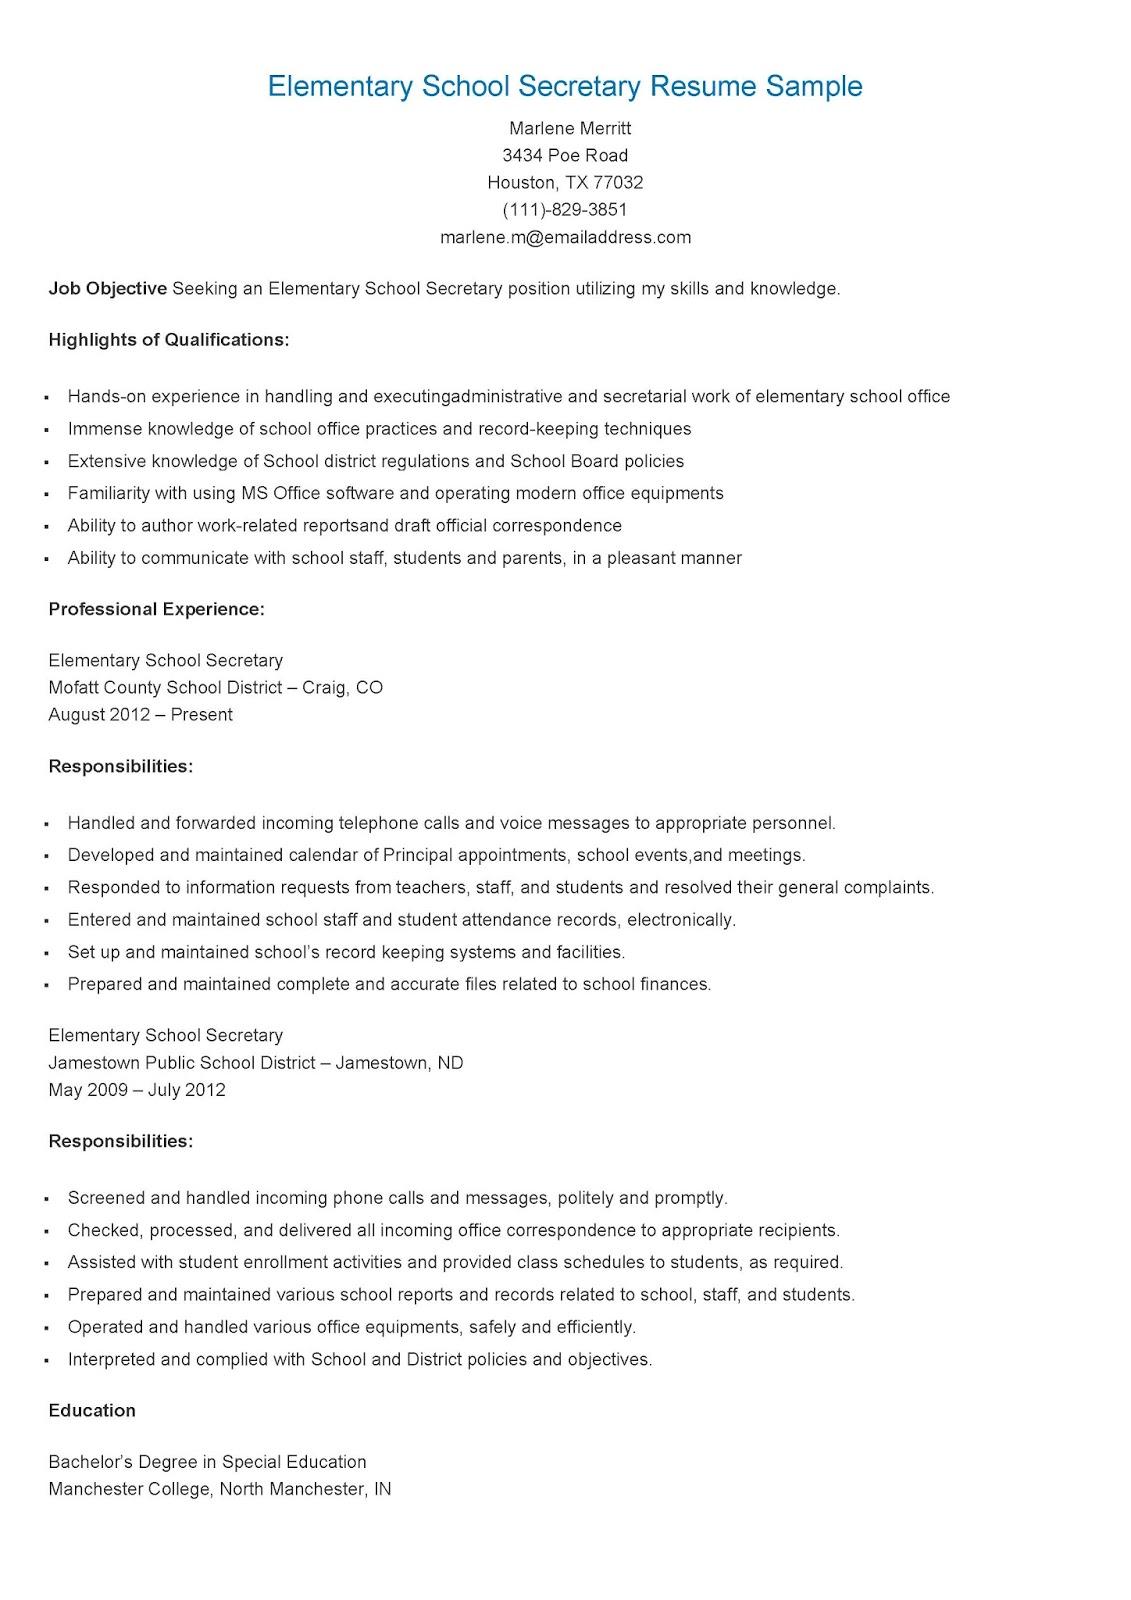 Resume Samples Elementary School Secretary Resume Sample